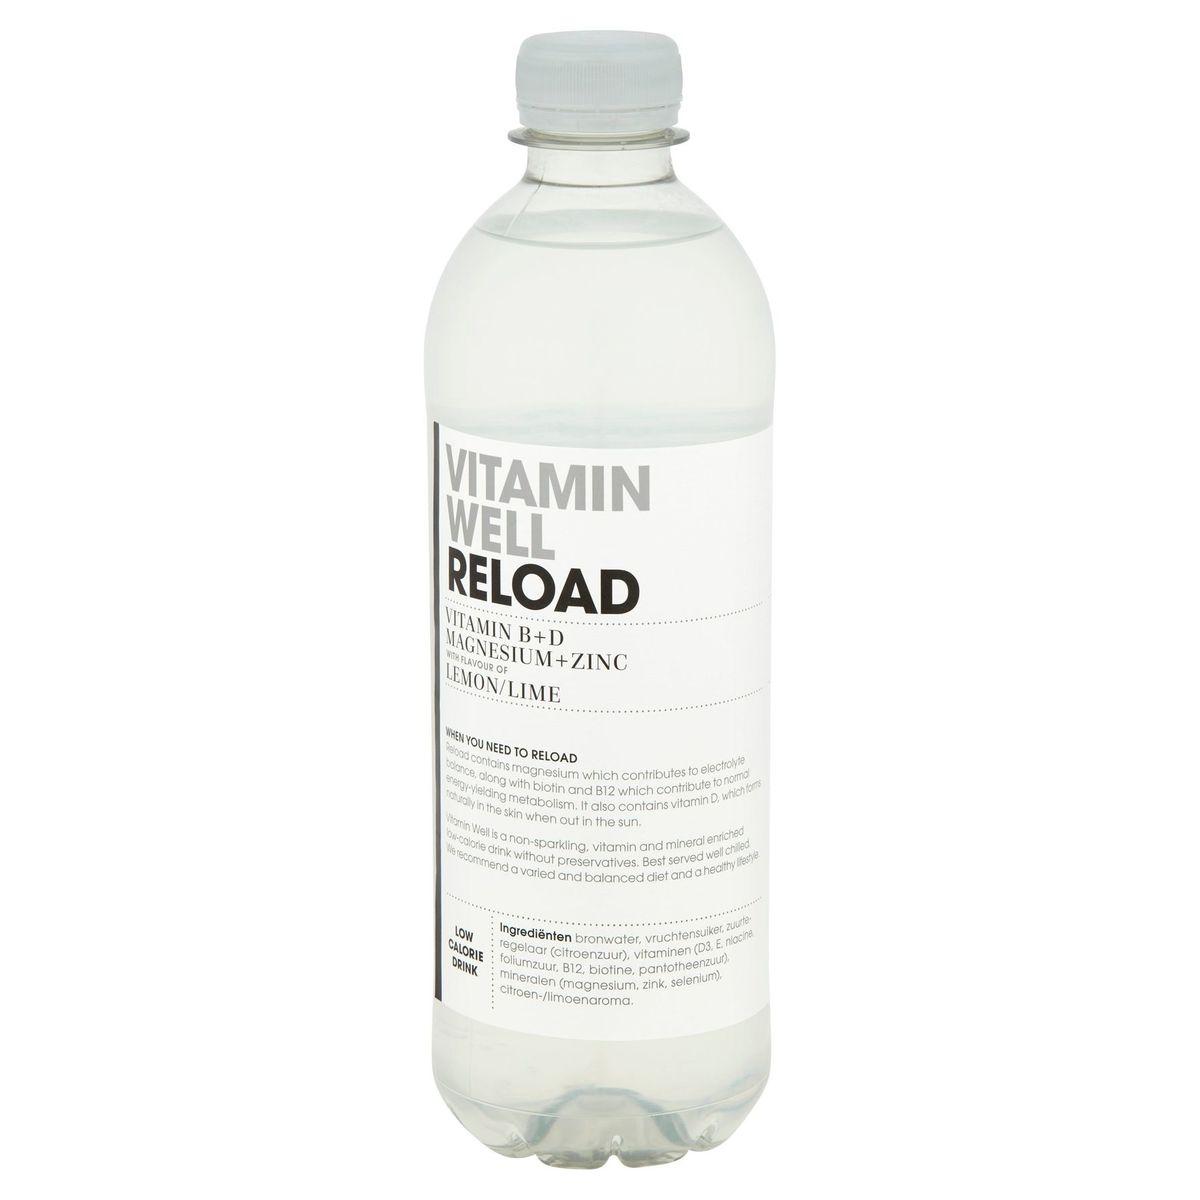 Vitamin Well Reload Vitamin B+D Magnesium+Zinc Lemon/Lime 500 ml